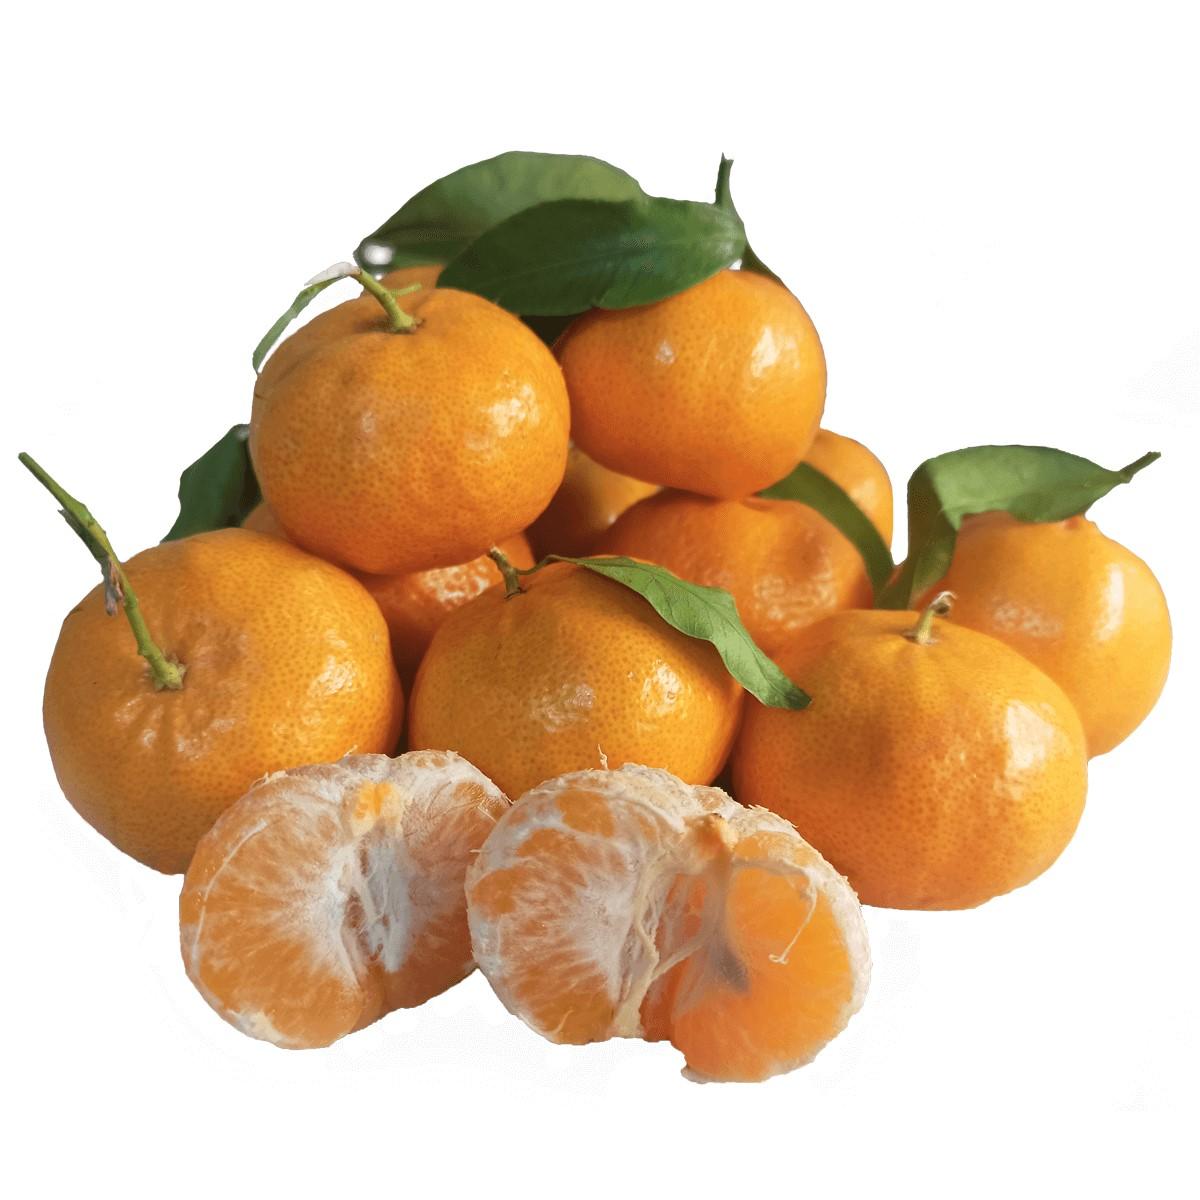 Mandarini Ciaculli Biologici